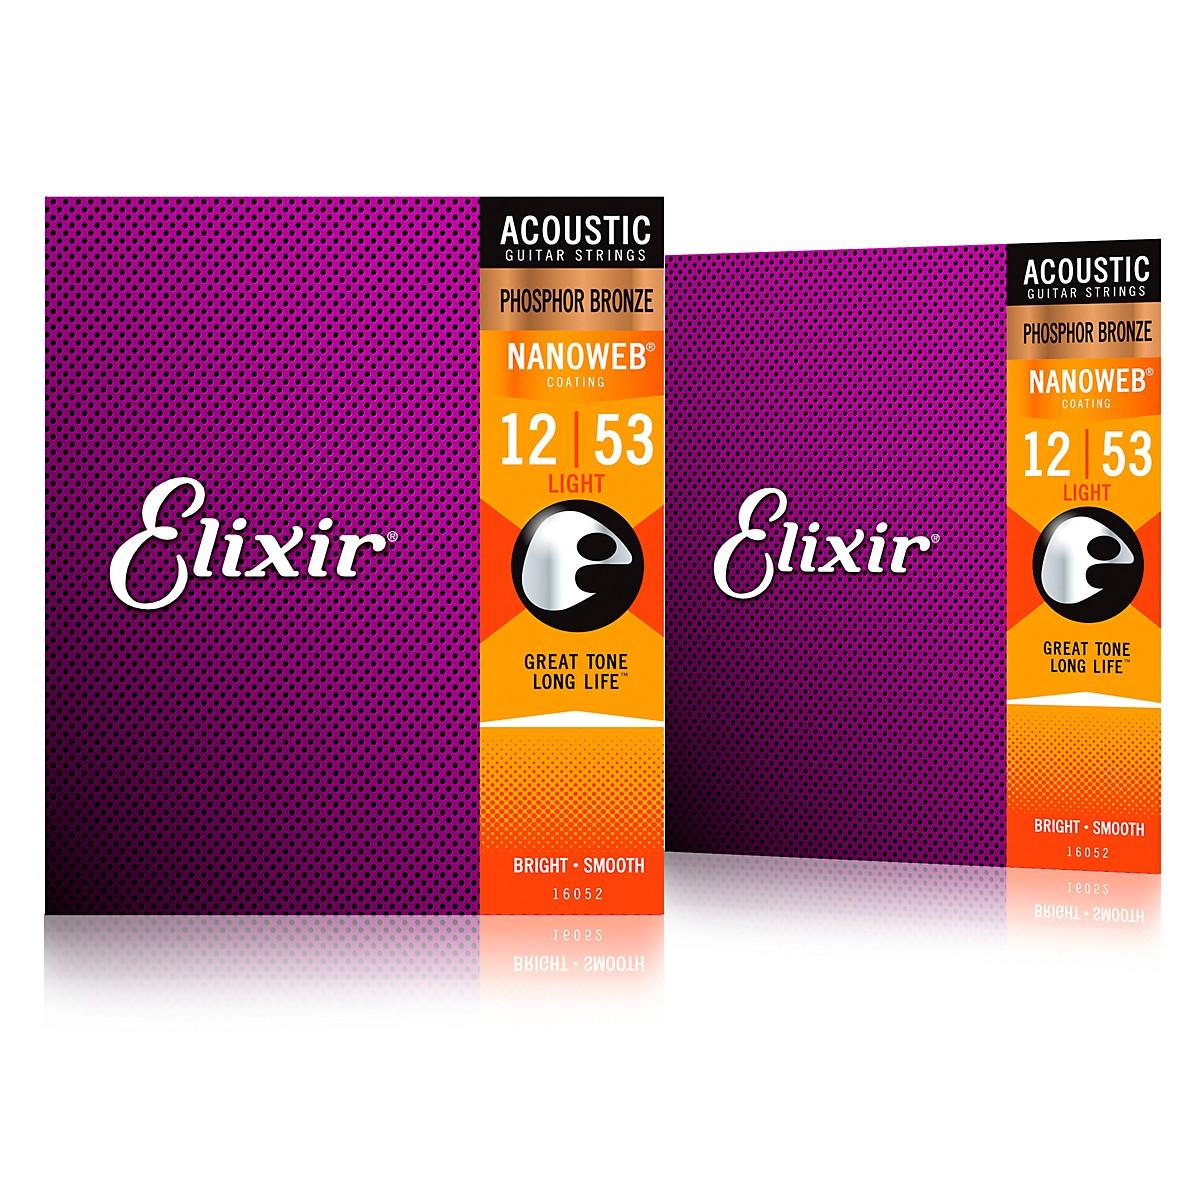 Elixir Phosphor Bronze Acoustic Guitar Strings with NANOWEB Coating, Light (.012-.053) 2-Pack